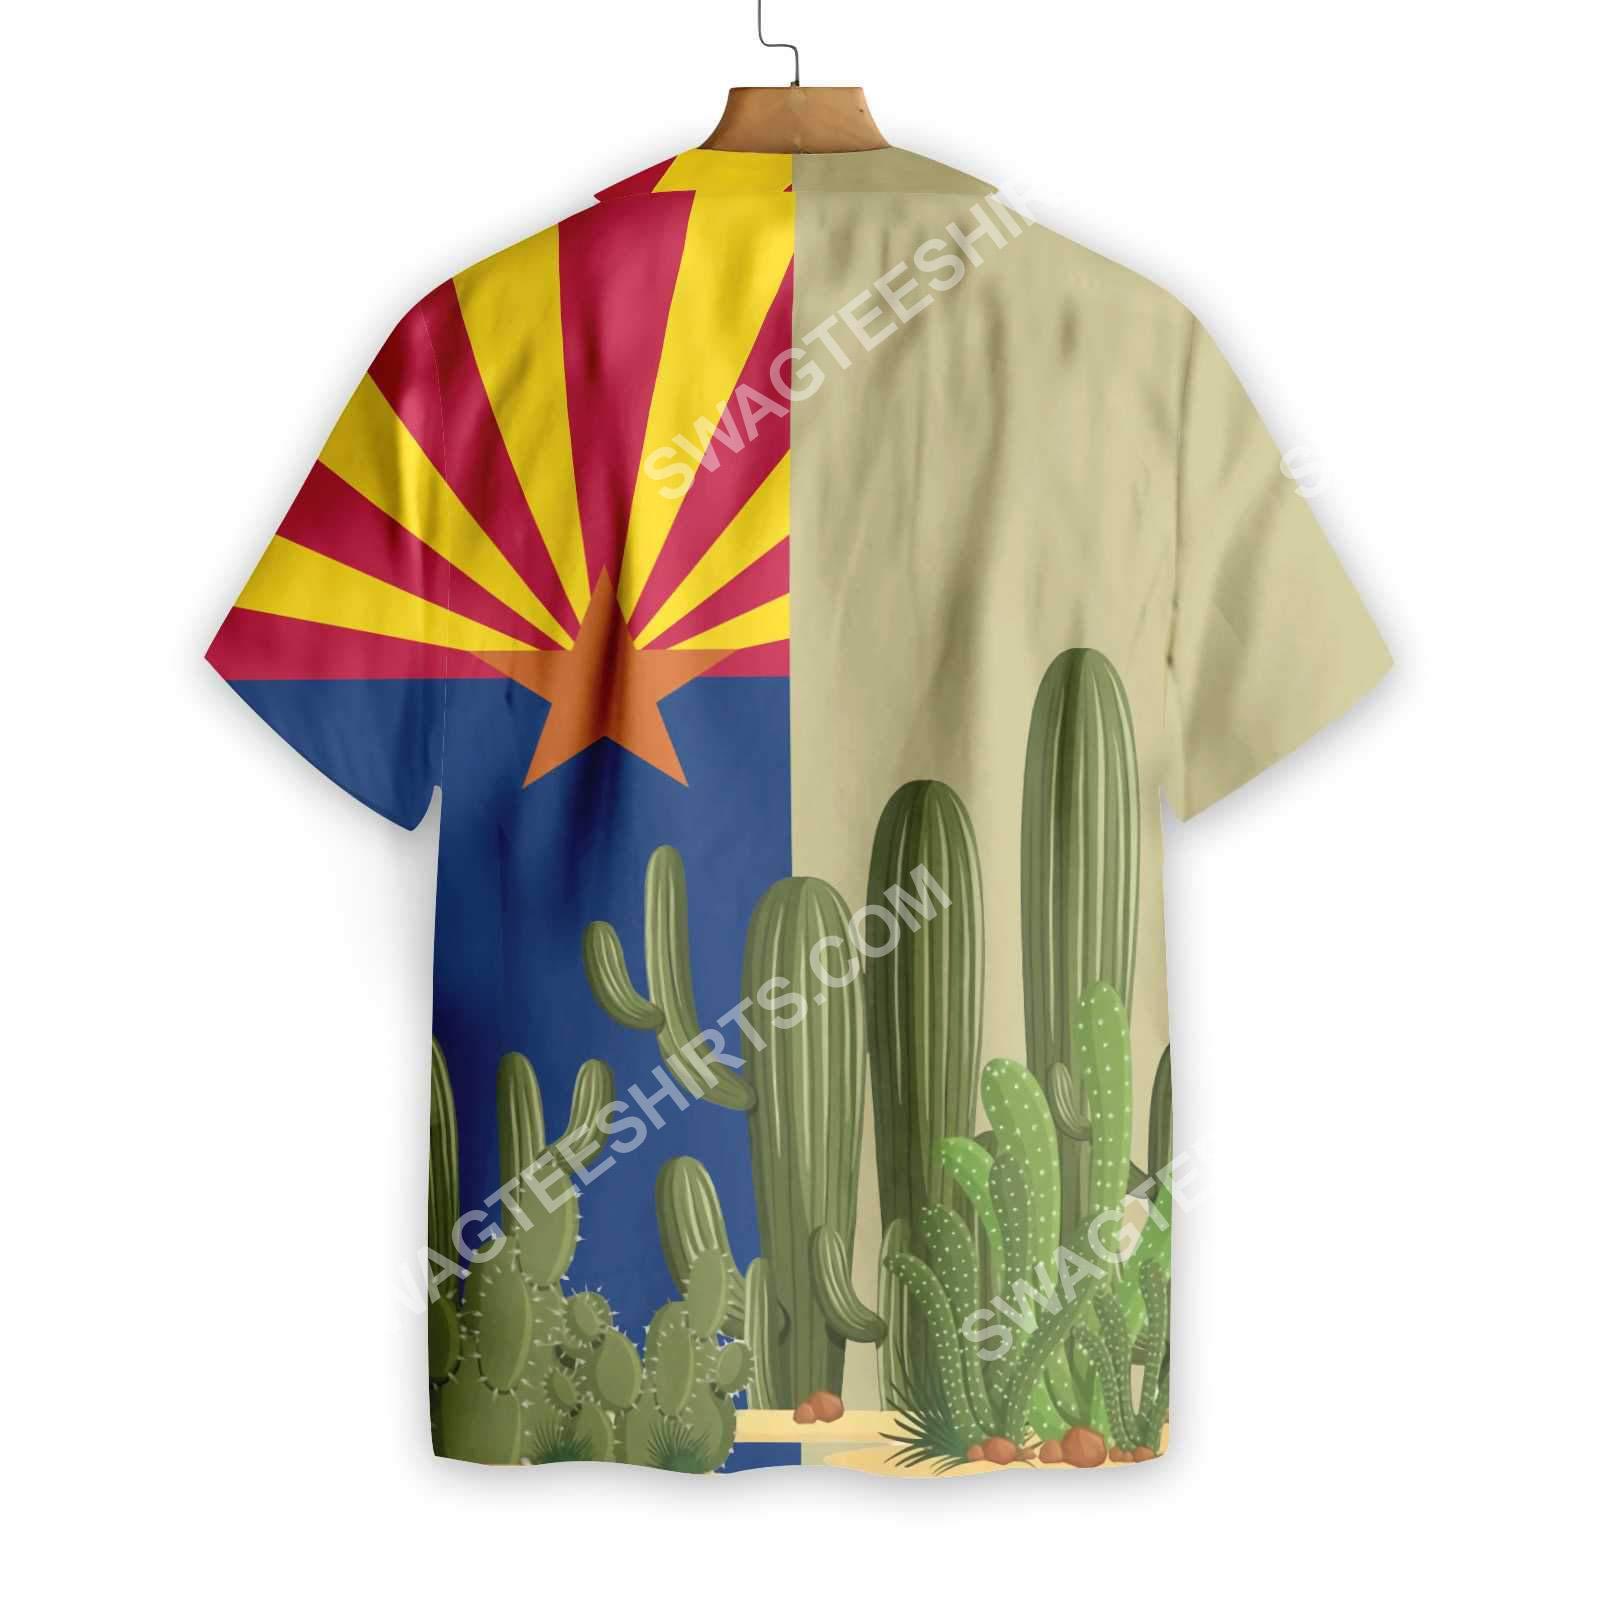 vintage arizona flag all over printed hawaiian shirt 2(1)